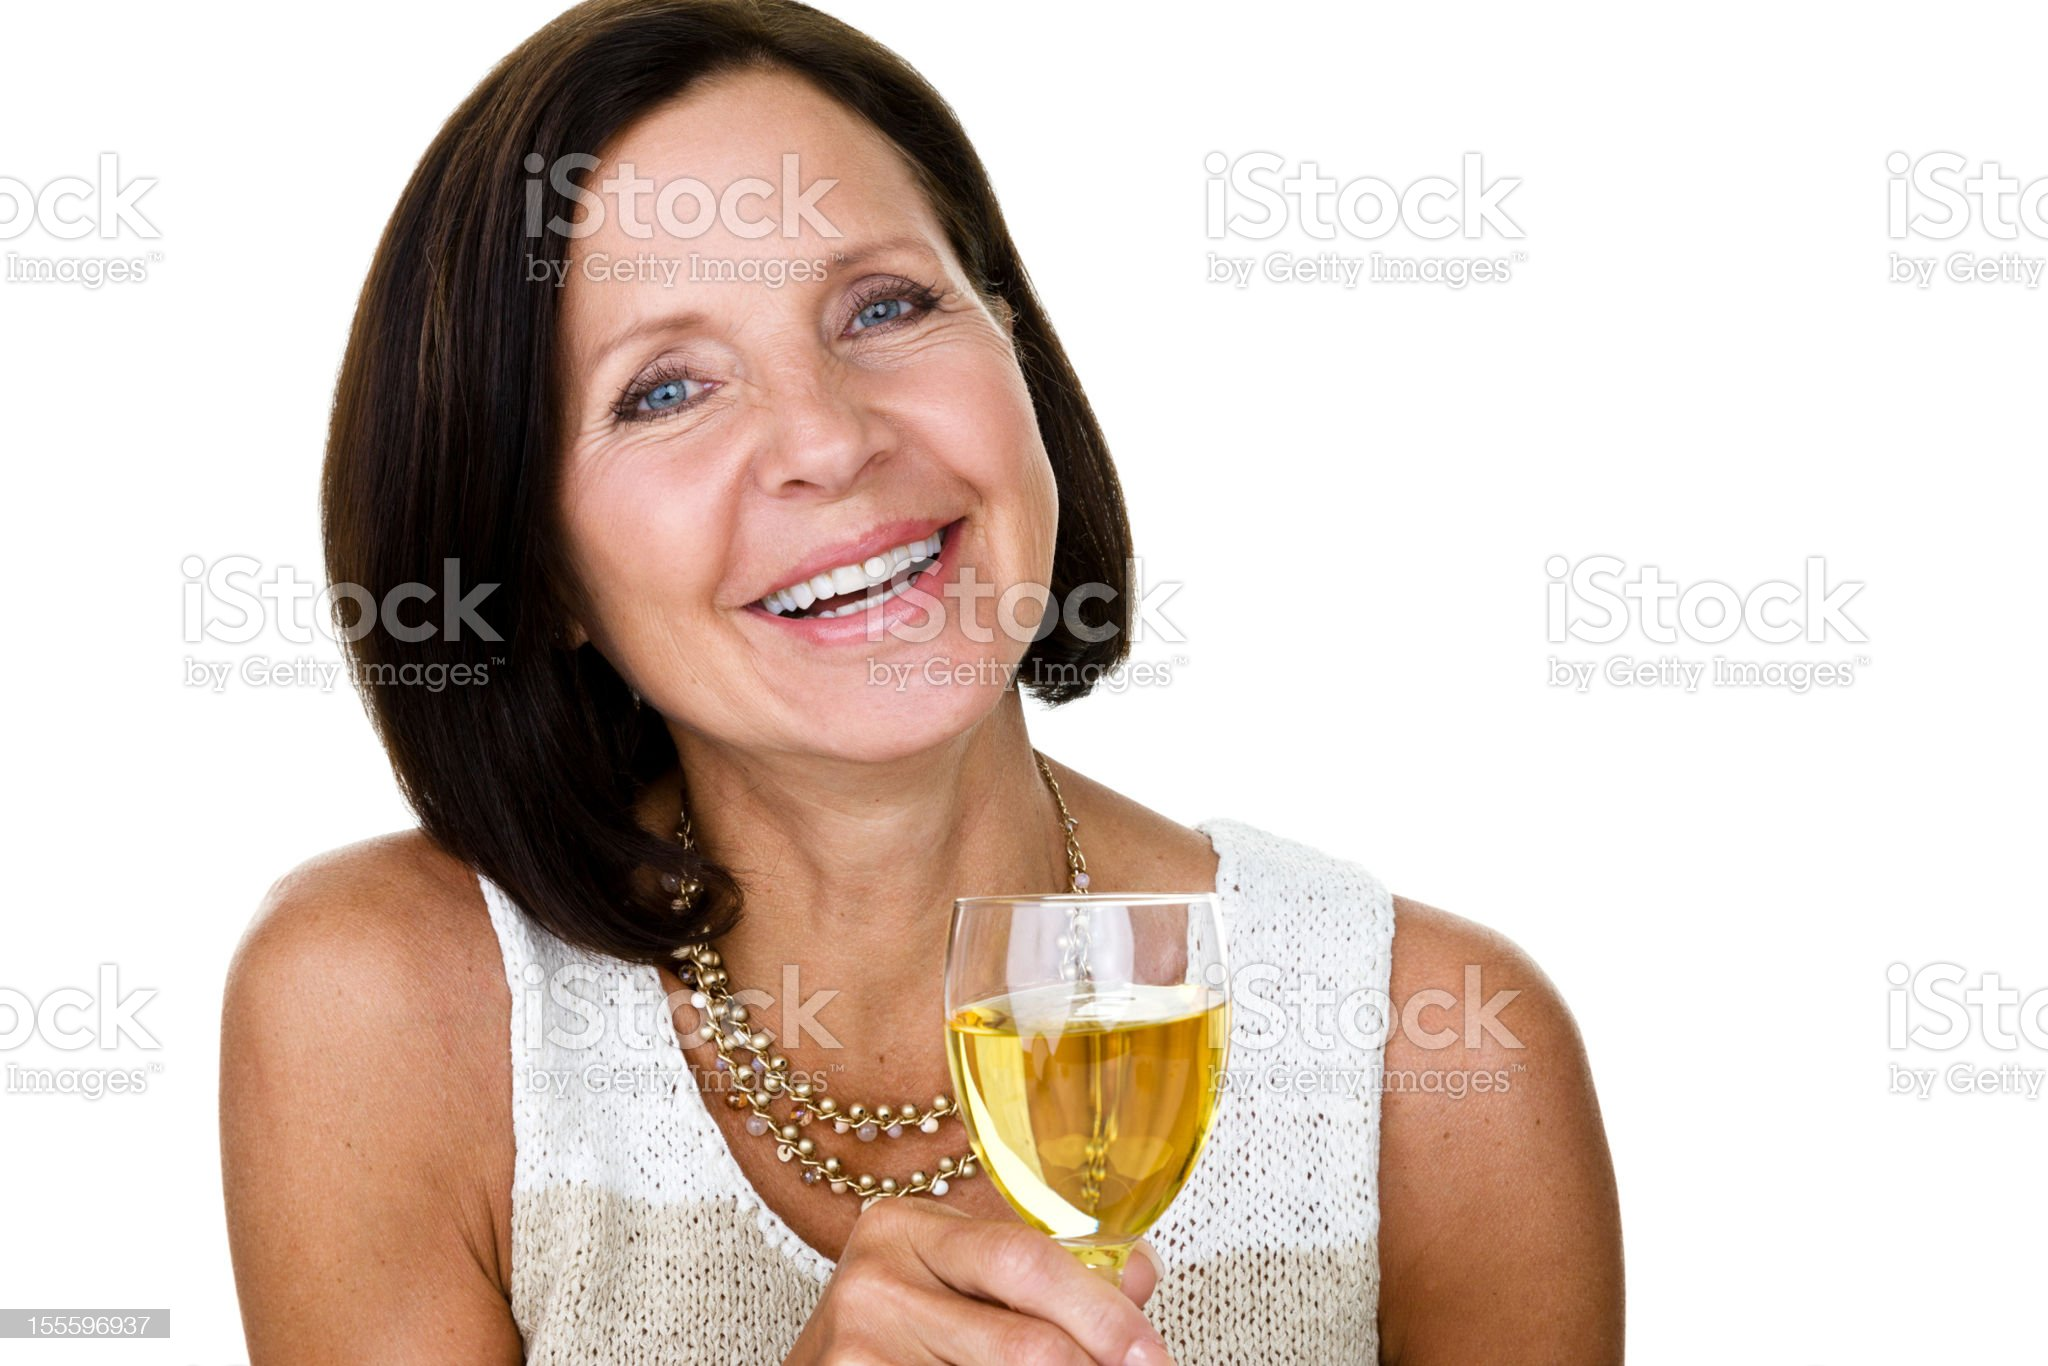 Mature woman drinking wine royalty-free stock photo